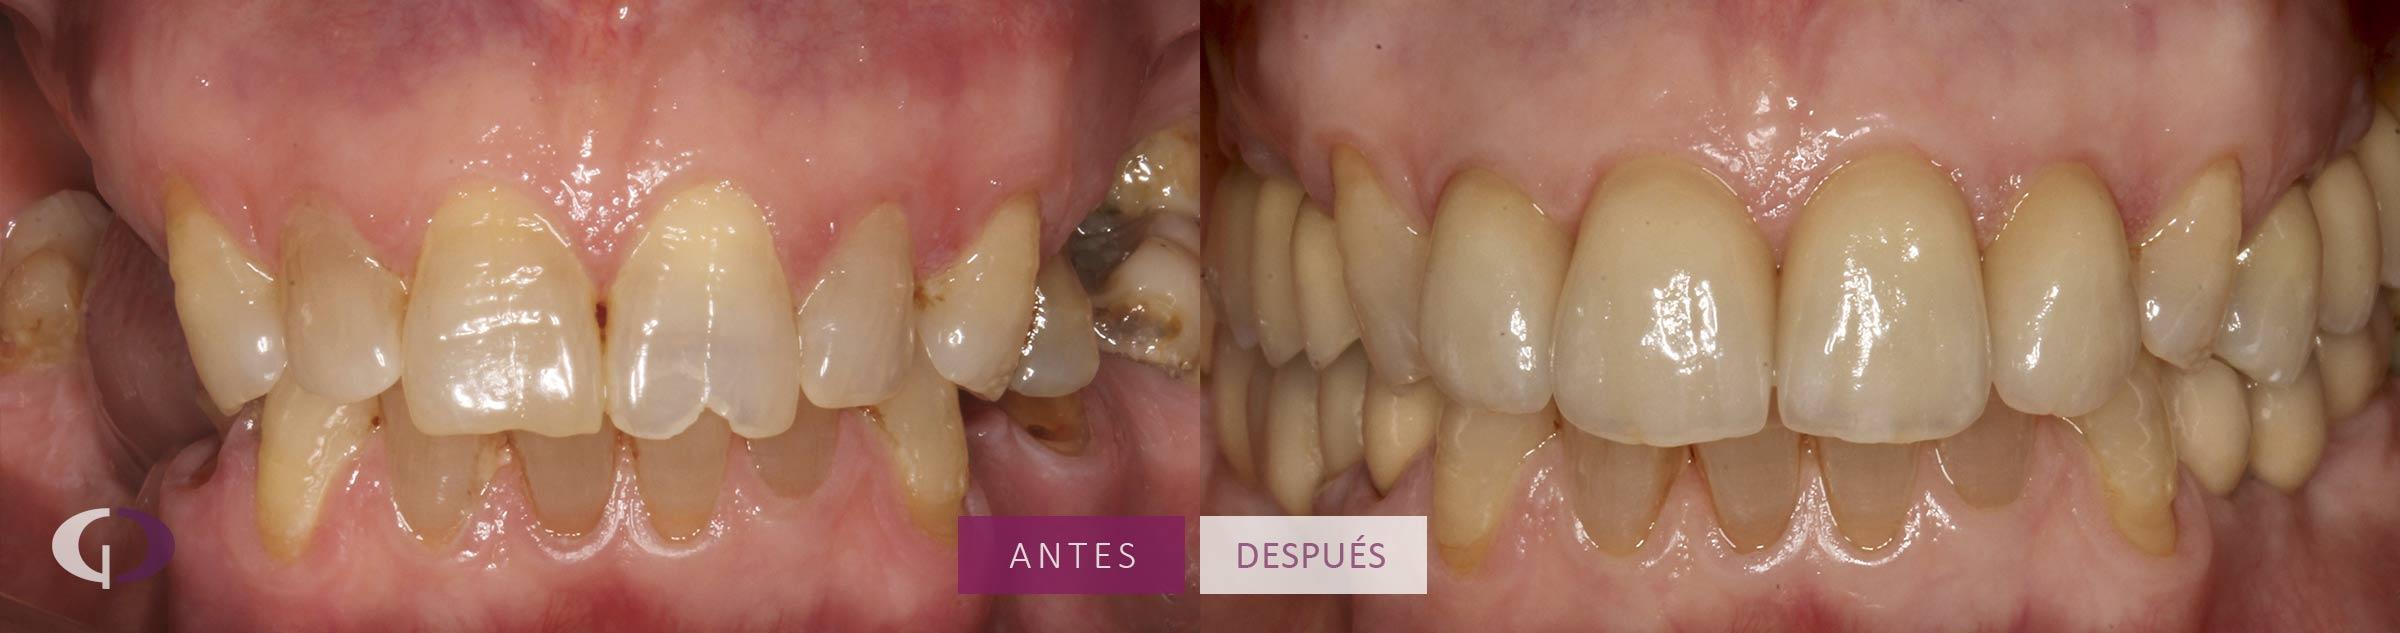 rehabilitacion-oral-completa-sevilla